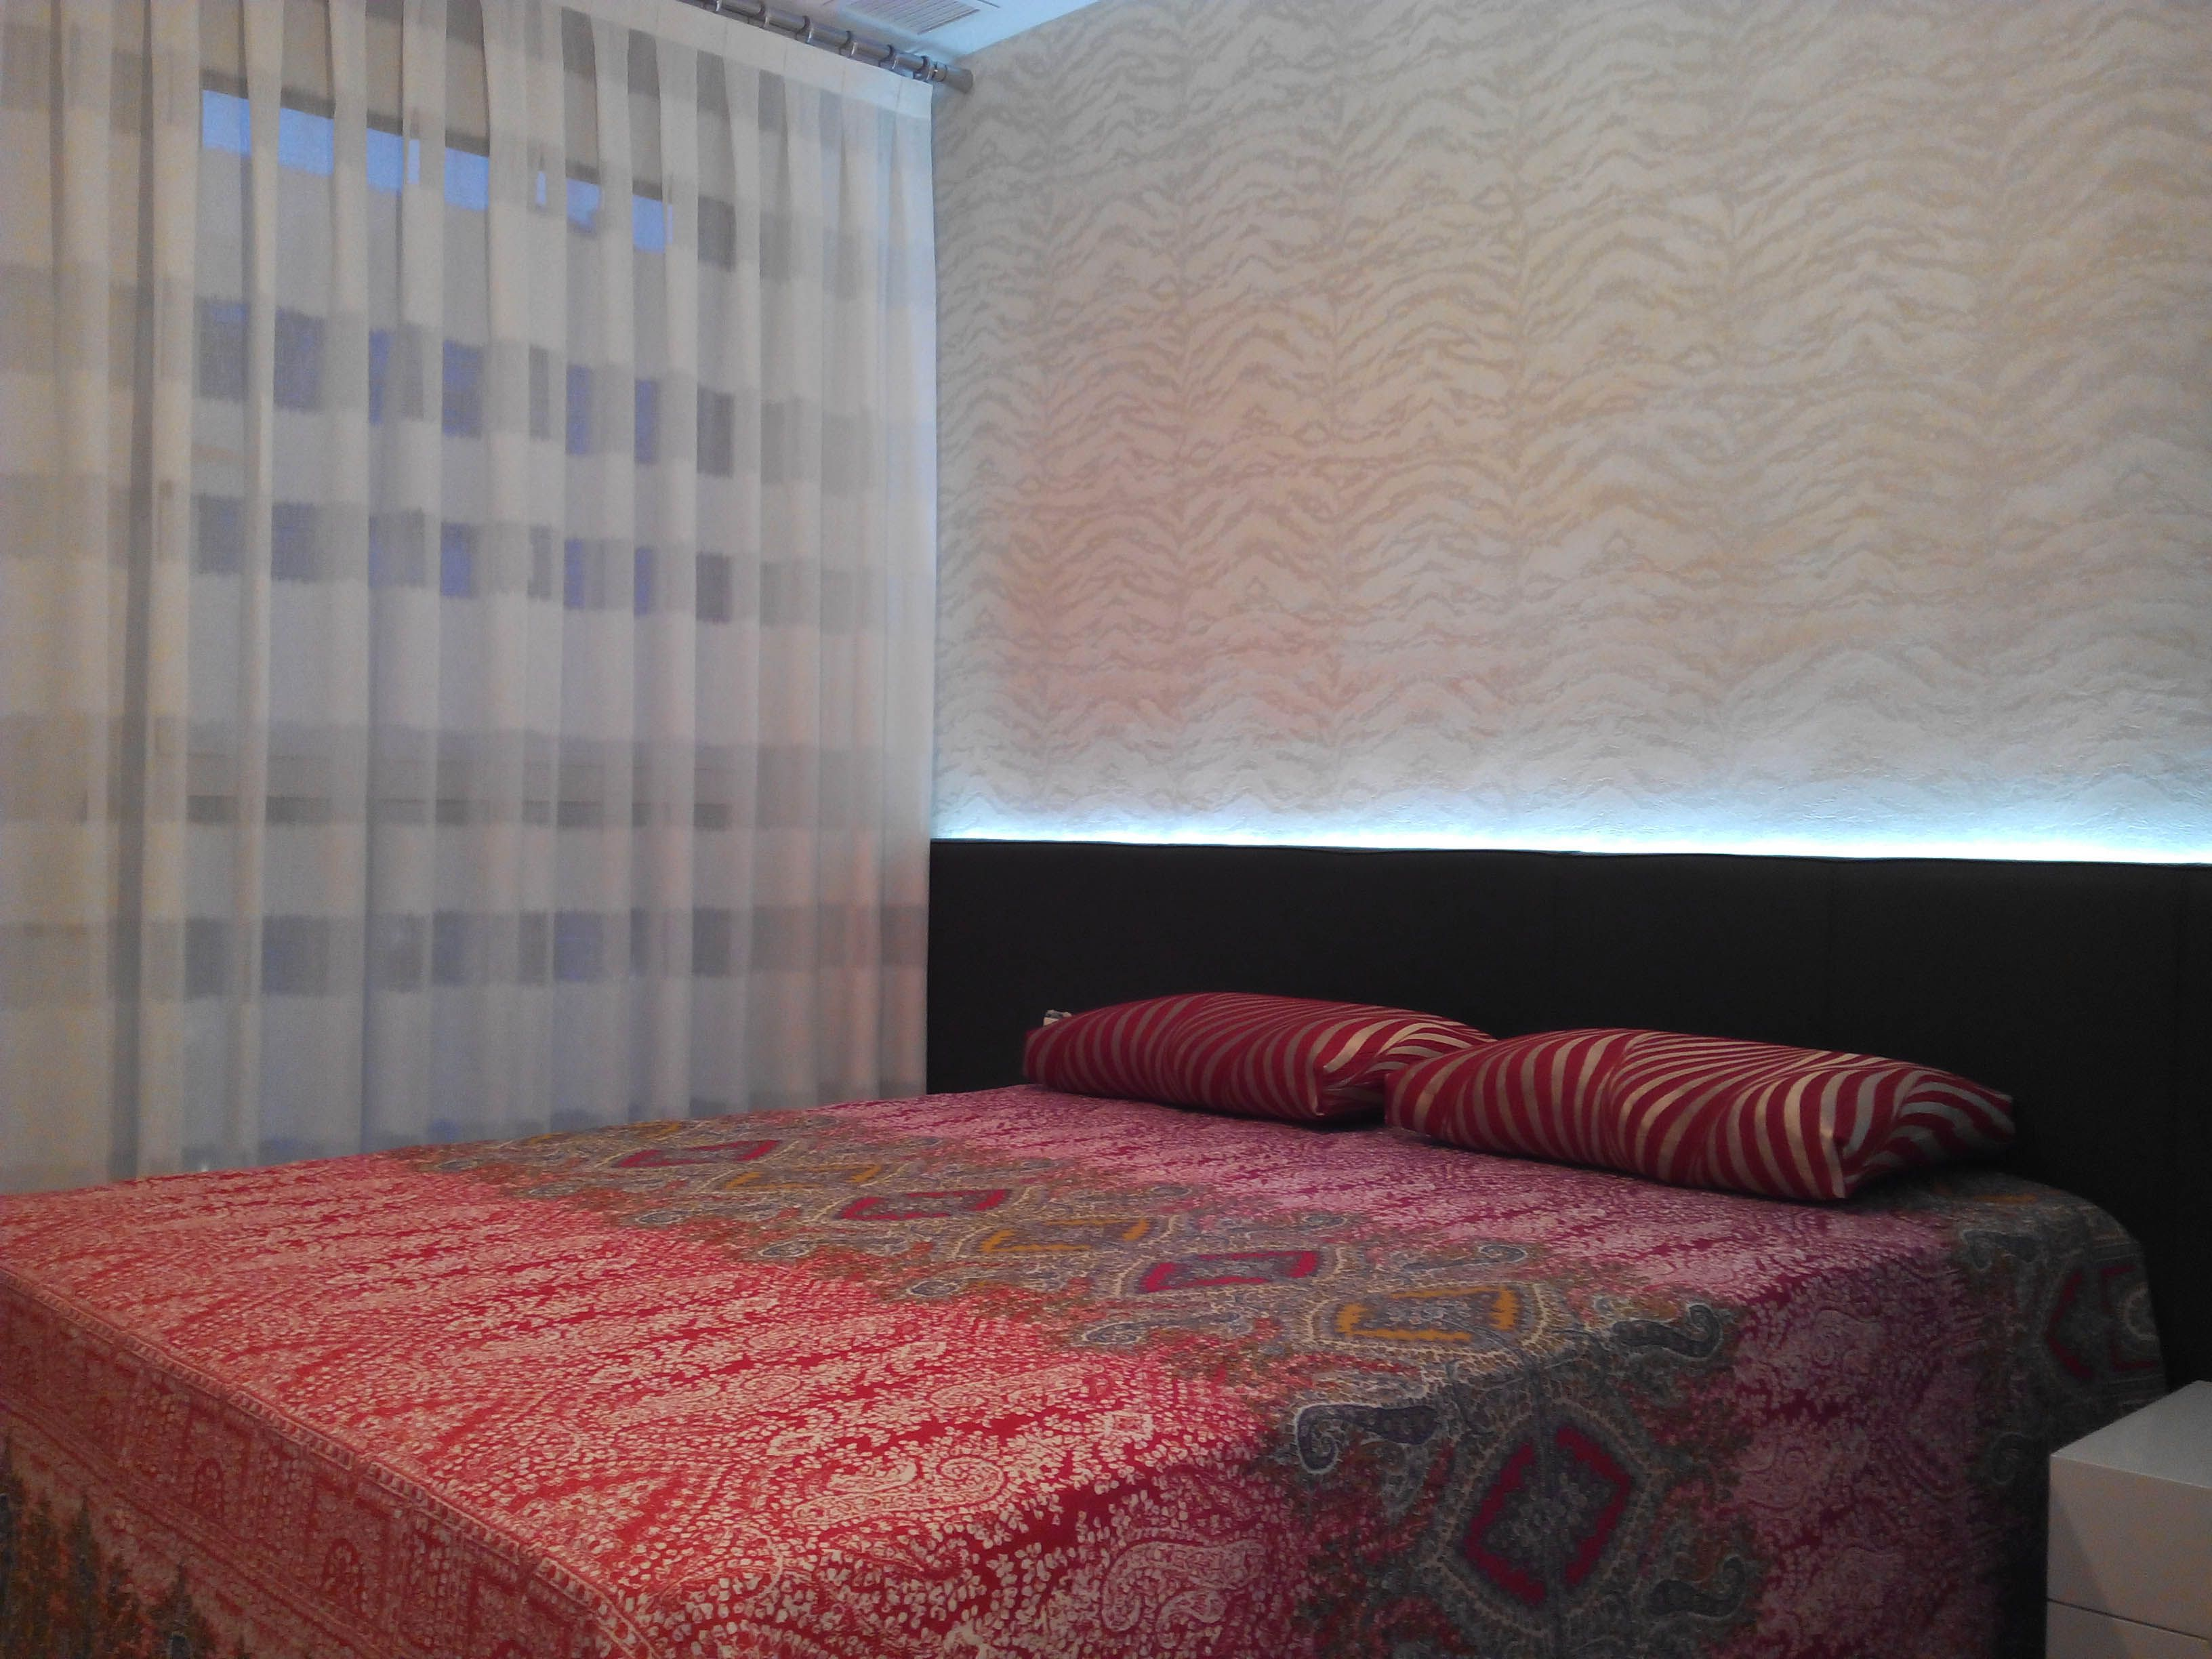 cortinas a rayas horizontales y papel pintado roberto cavalli villalba interiorismo - Papel Pintado Rayas Horizontales